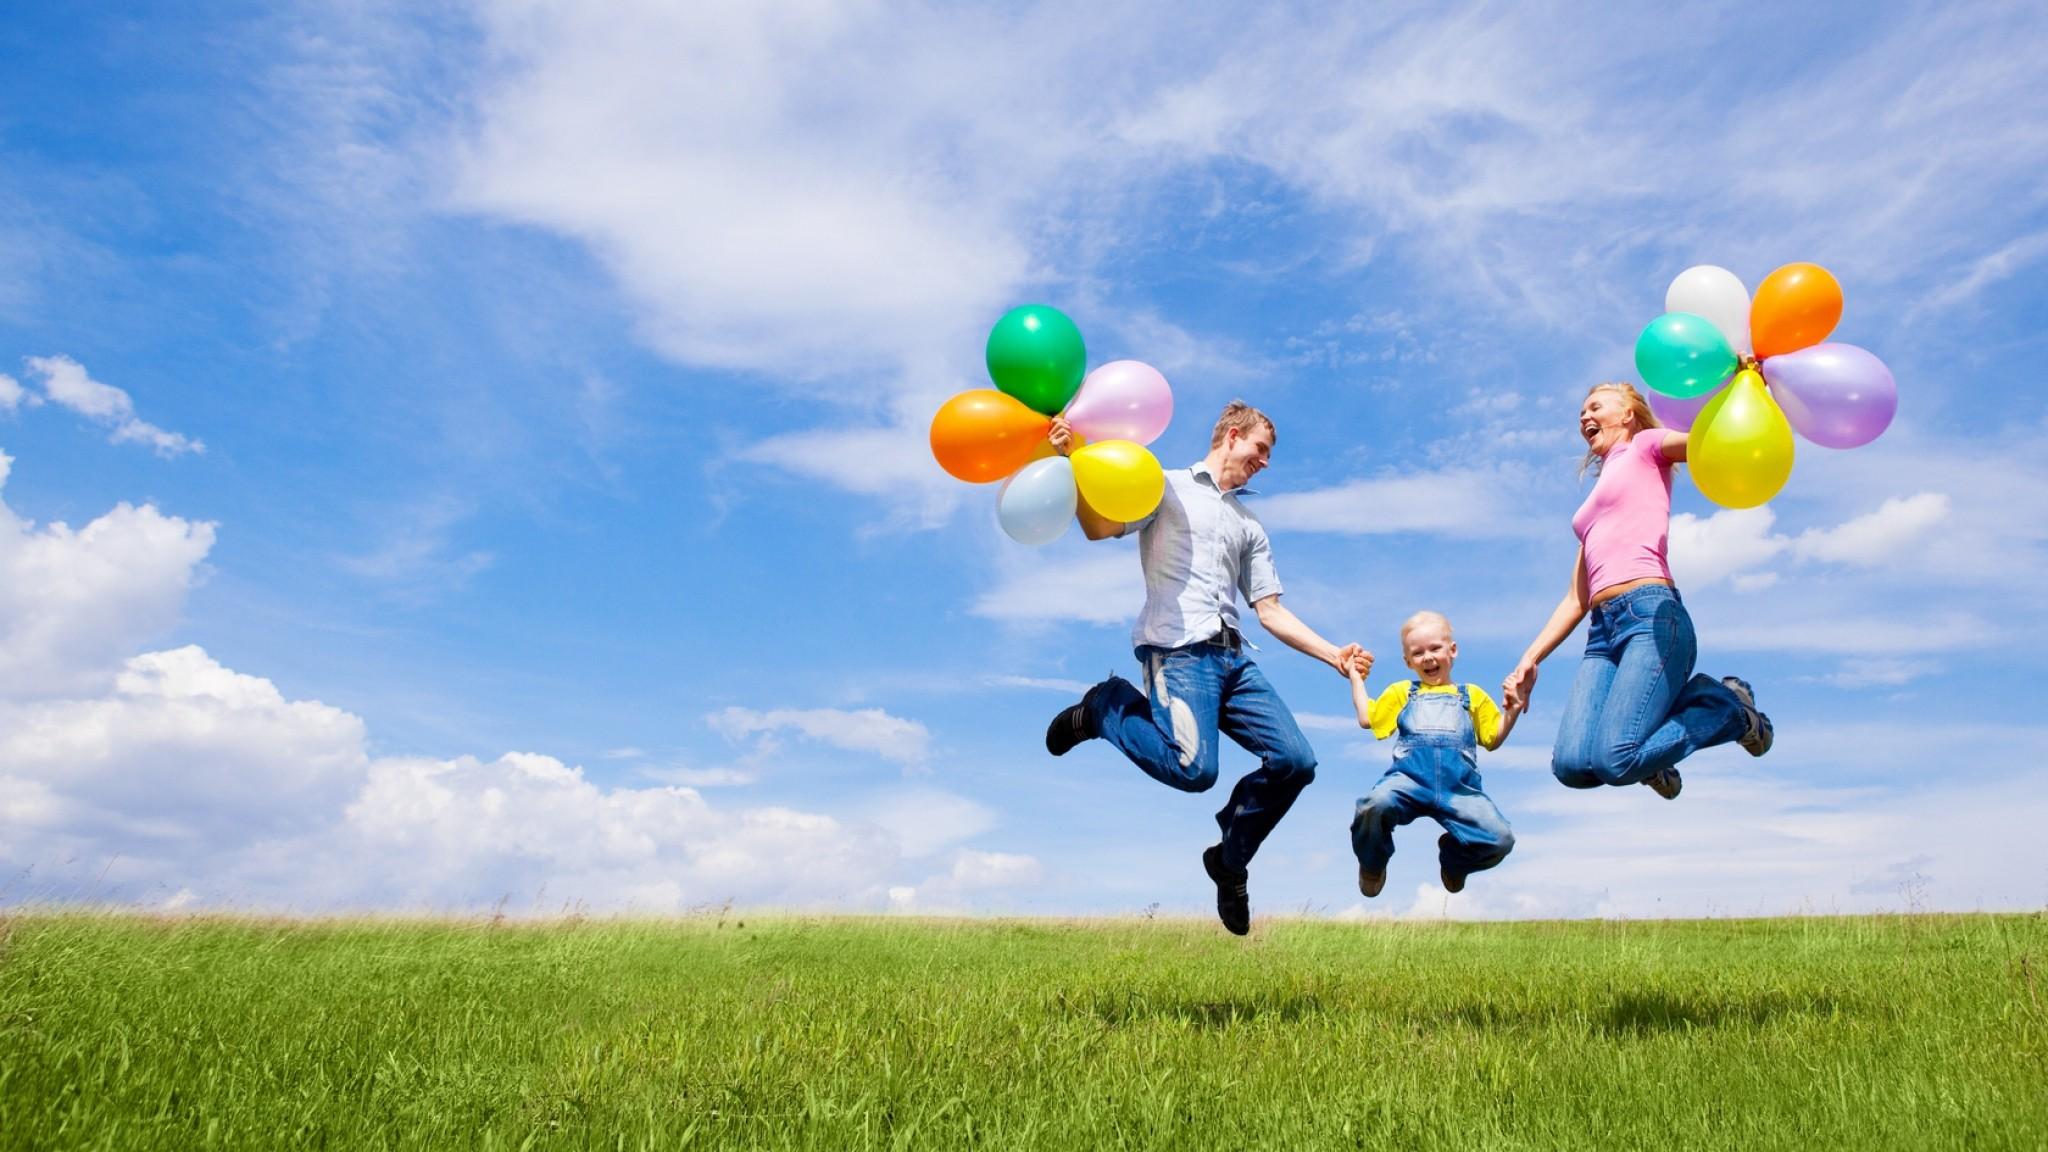 Wallpaper family, children, balloons, nature, holiday, joy